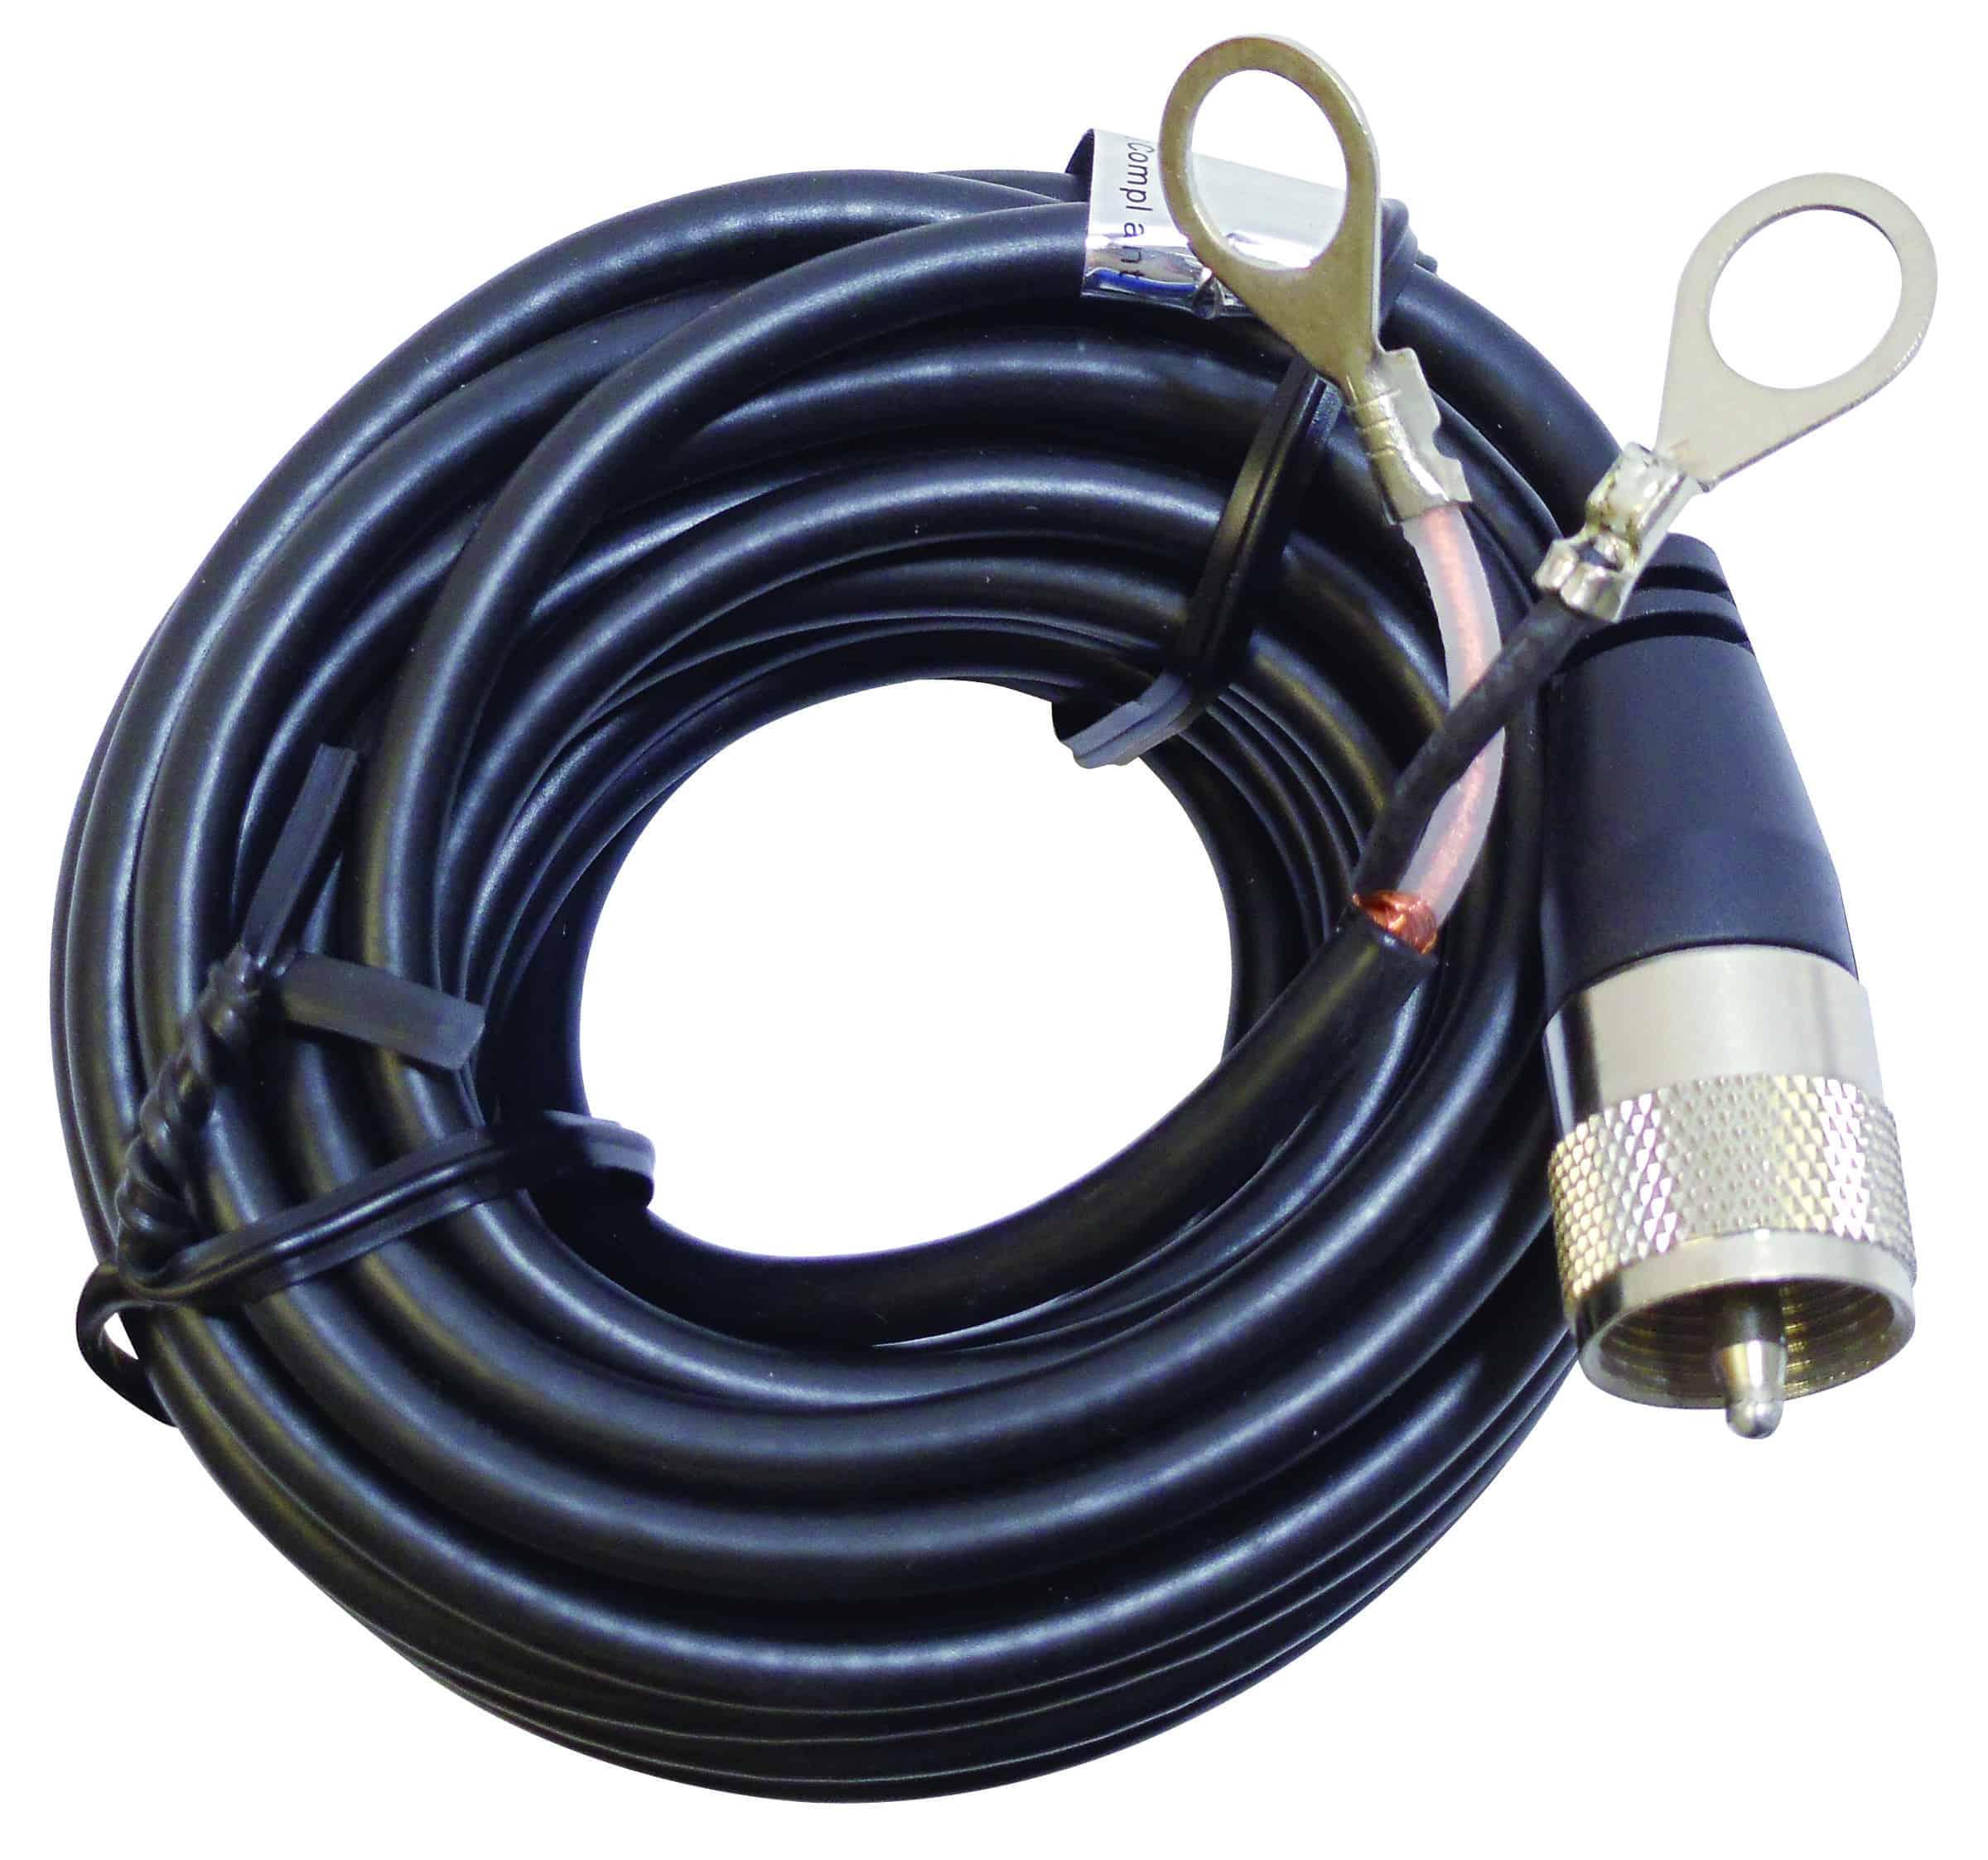 PL12X - Marmat 12' Single Lead Coax Cable